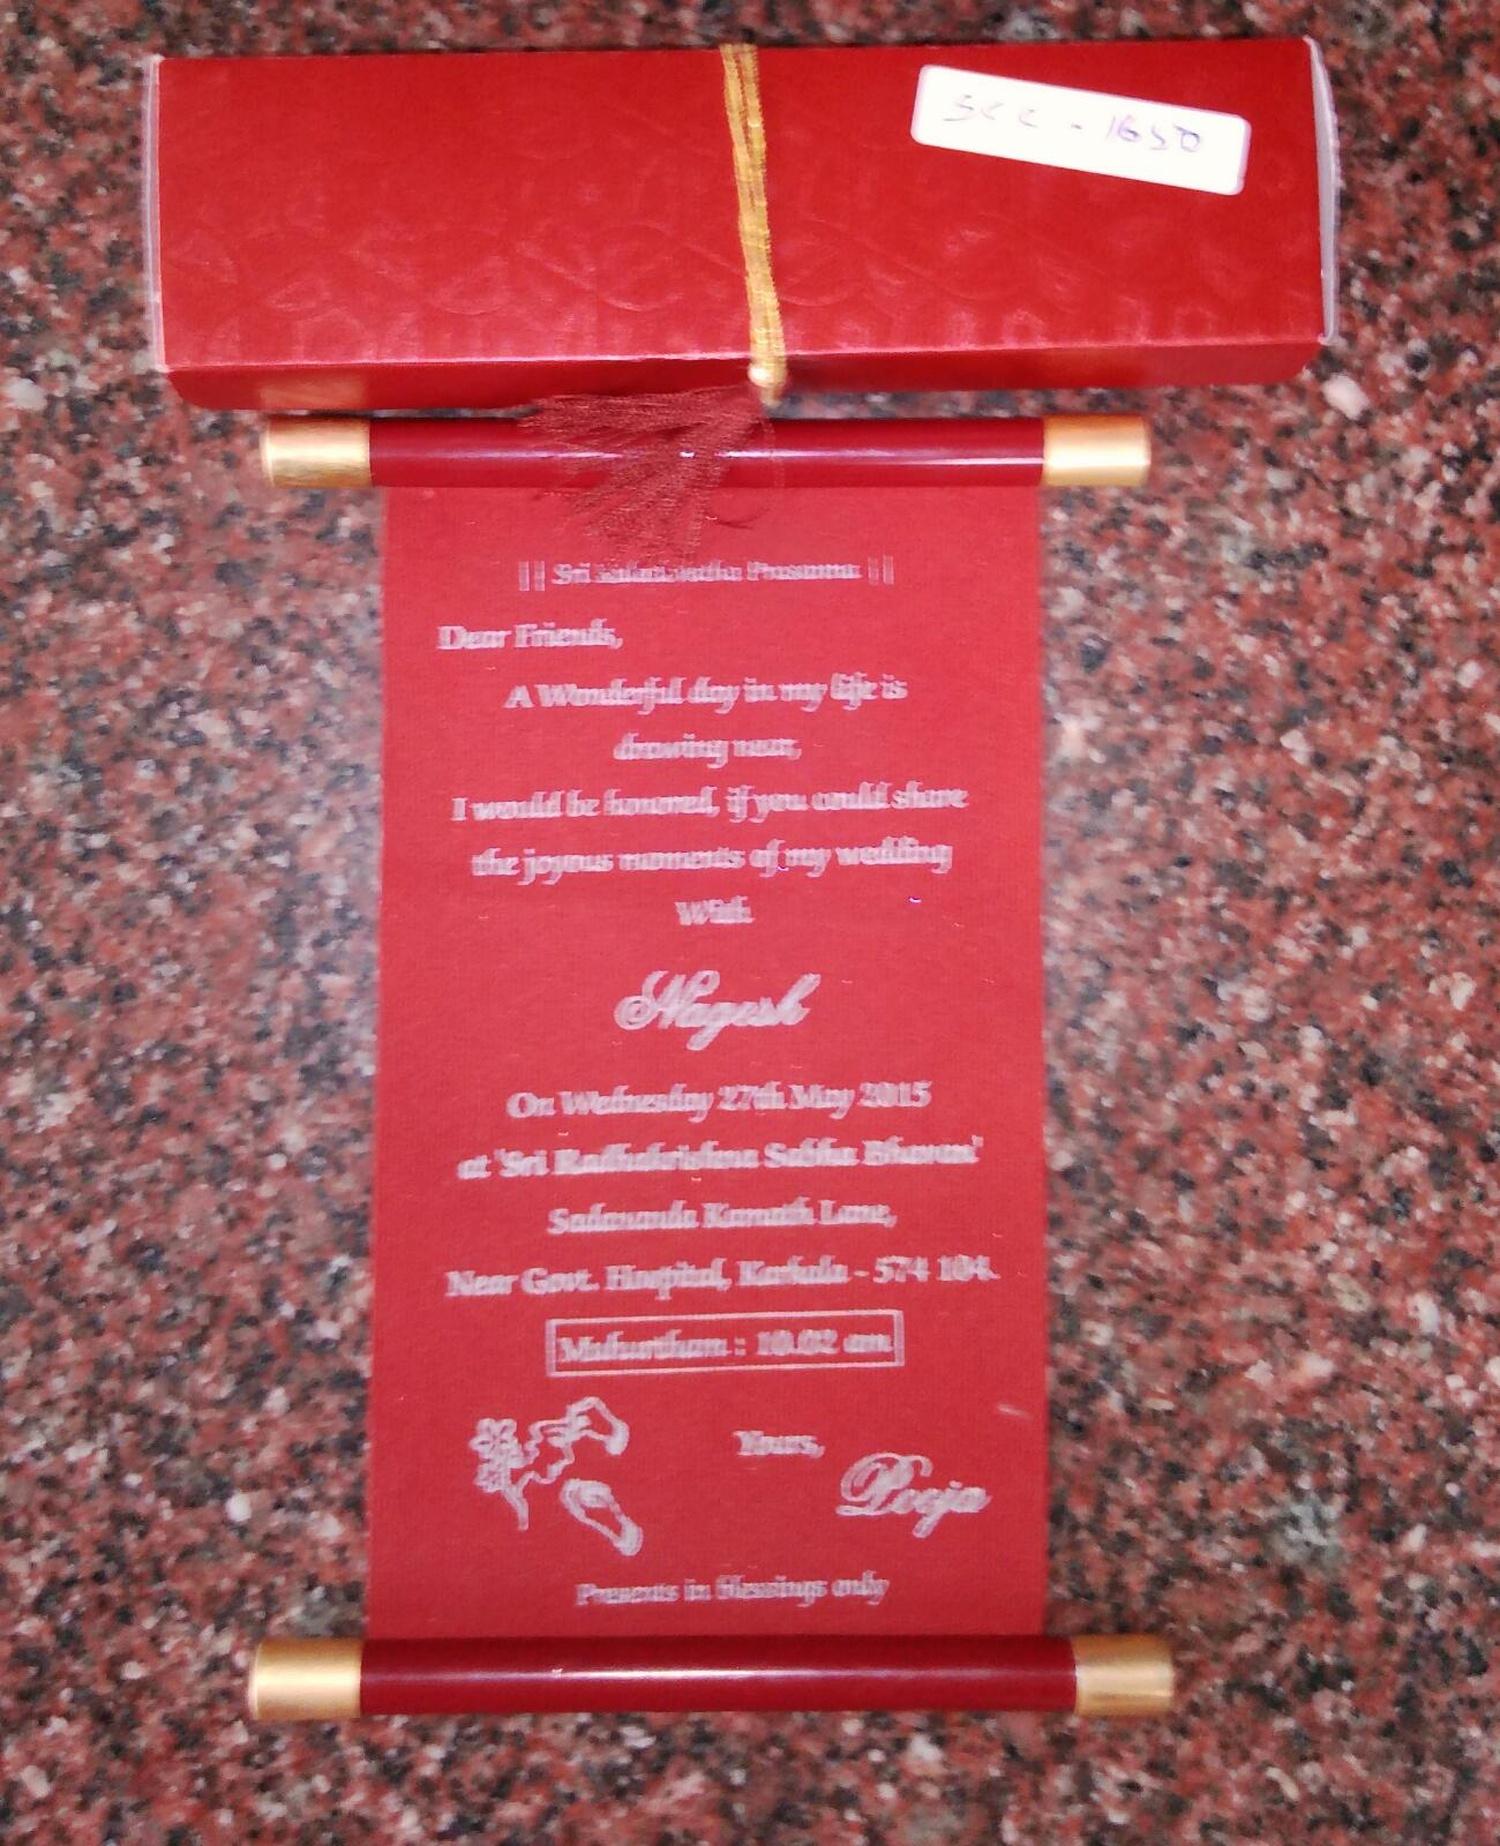 Sankeshwar Cards Creation, Wedding Invitation Card in Bangalore ...